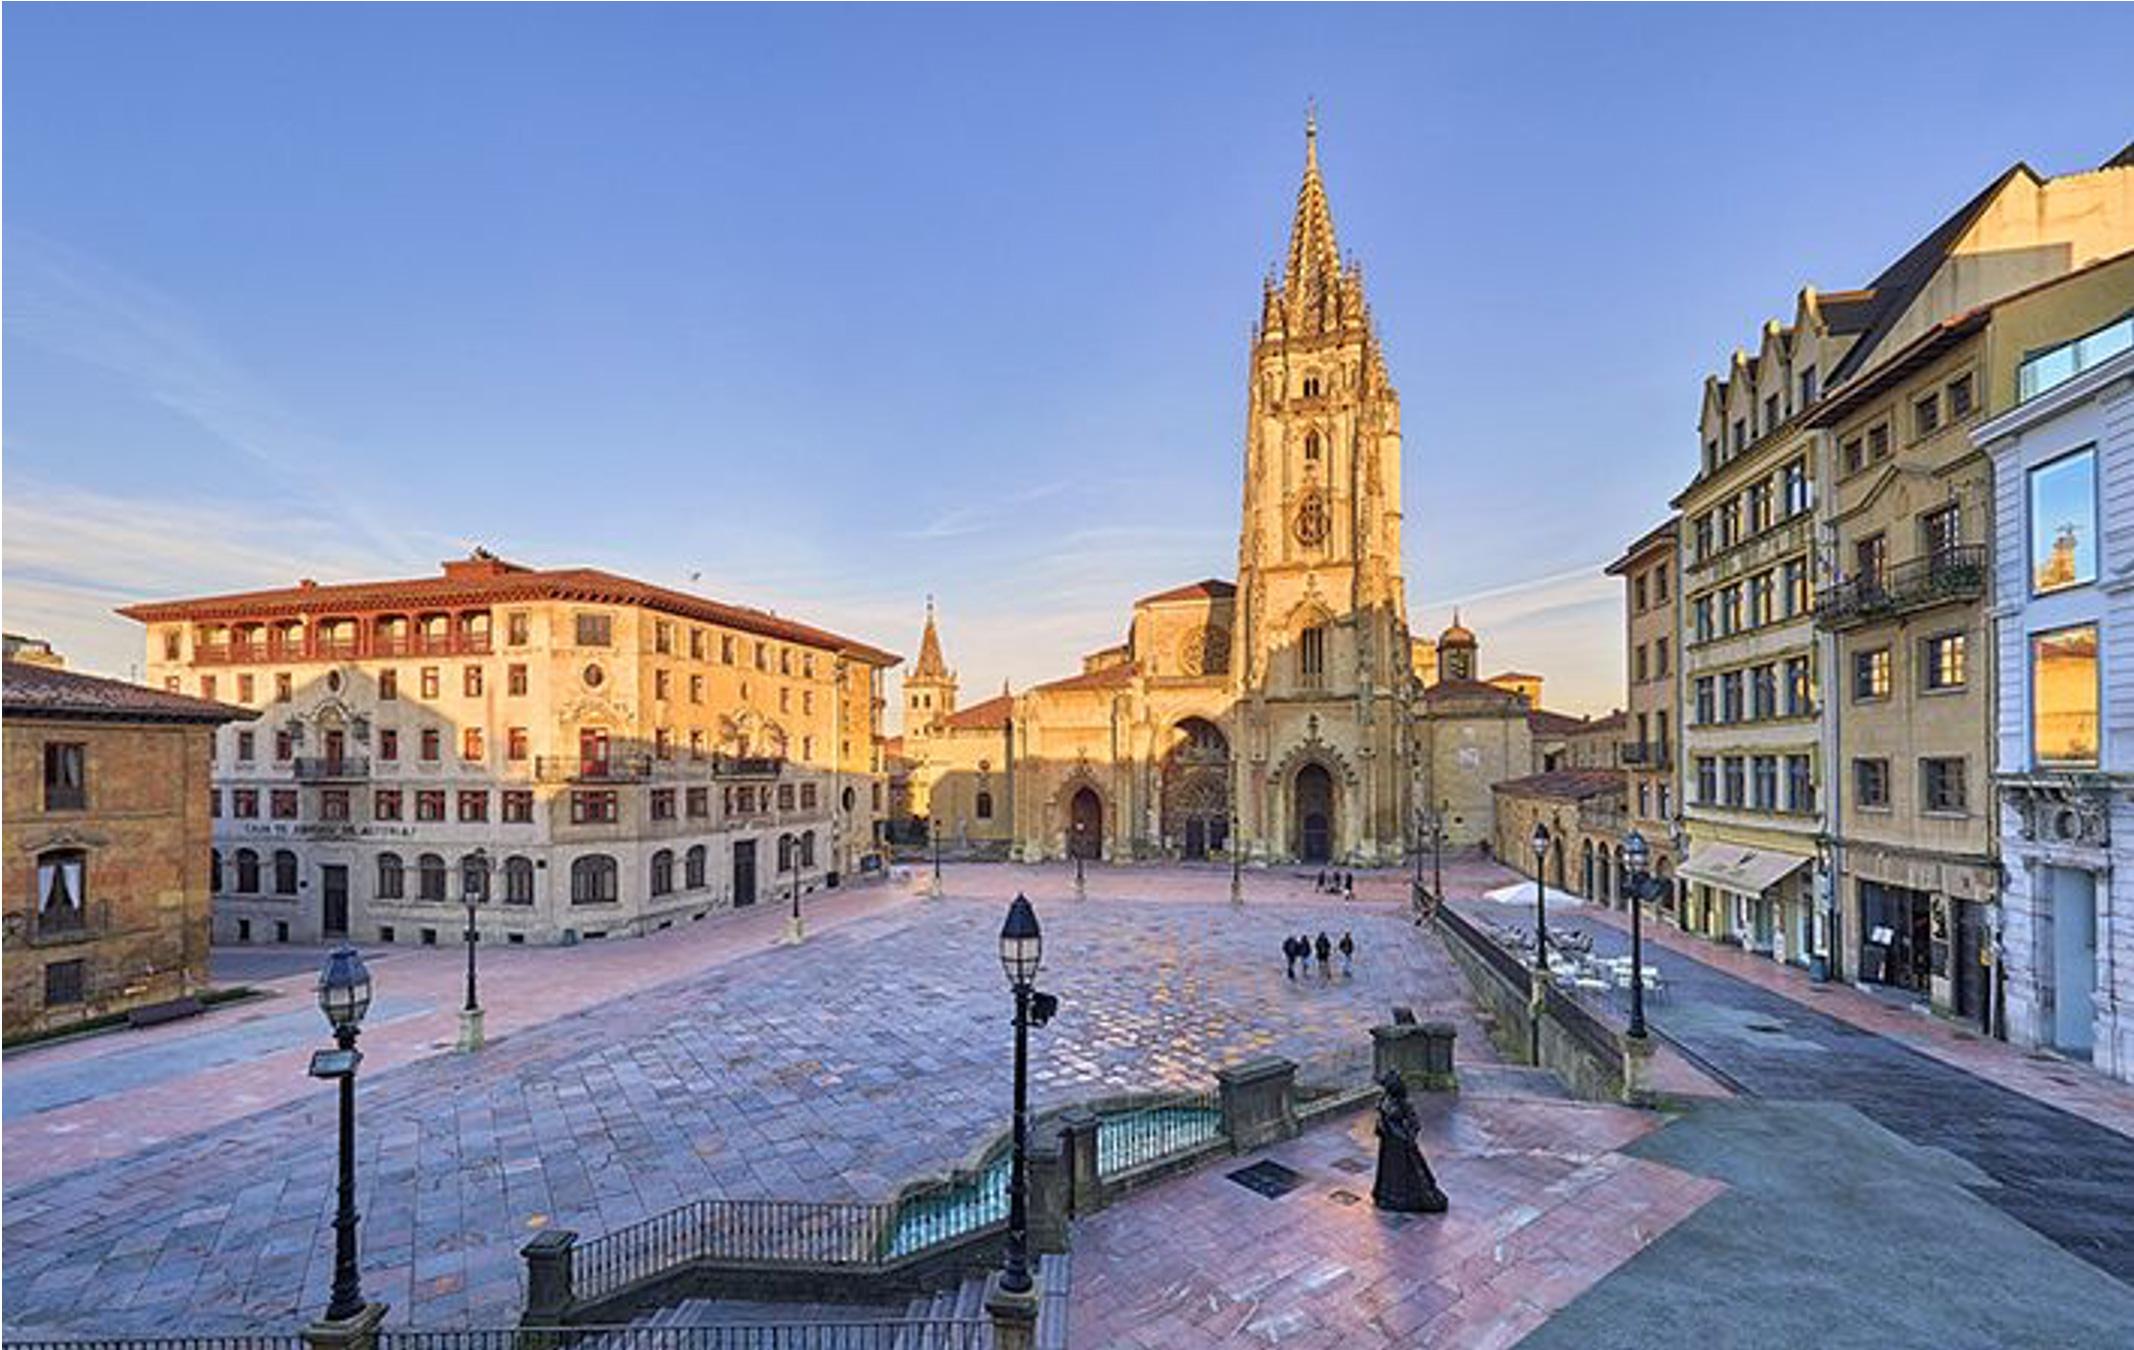 Oviedo / Gijón